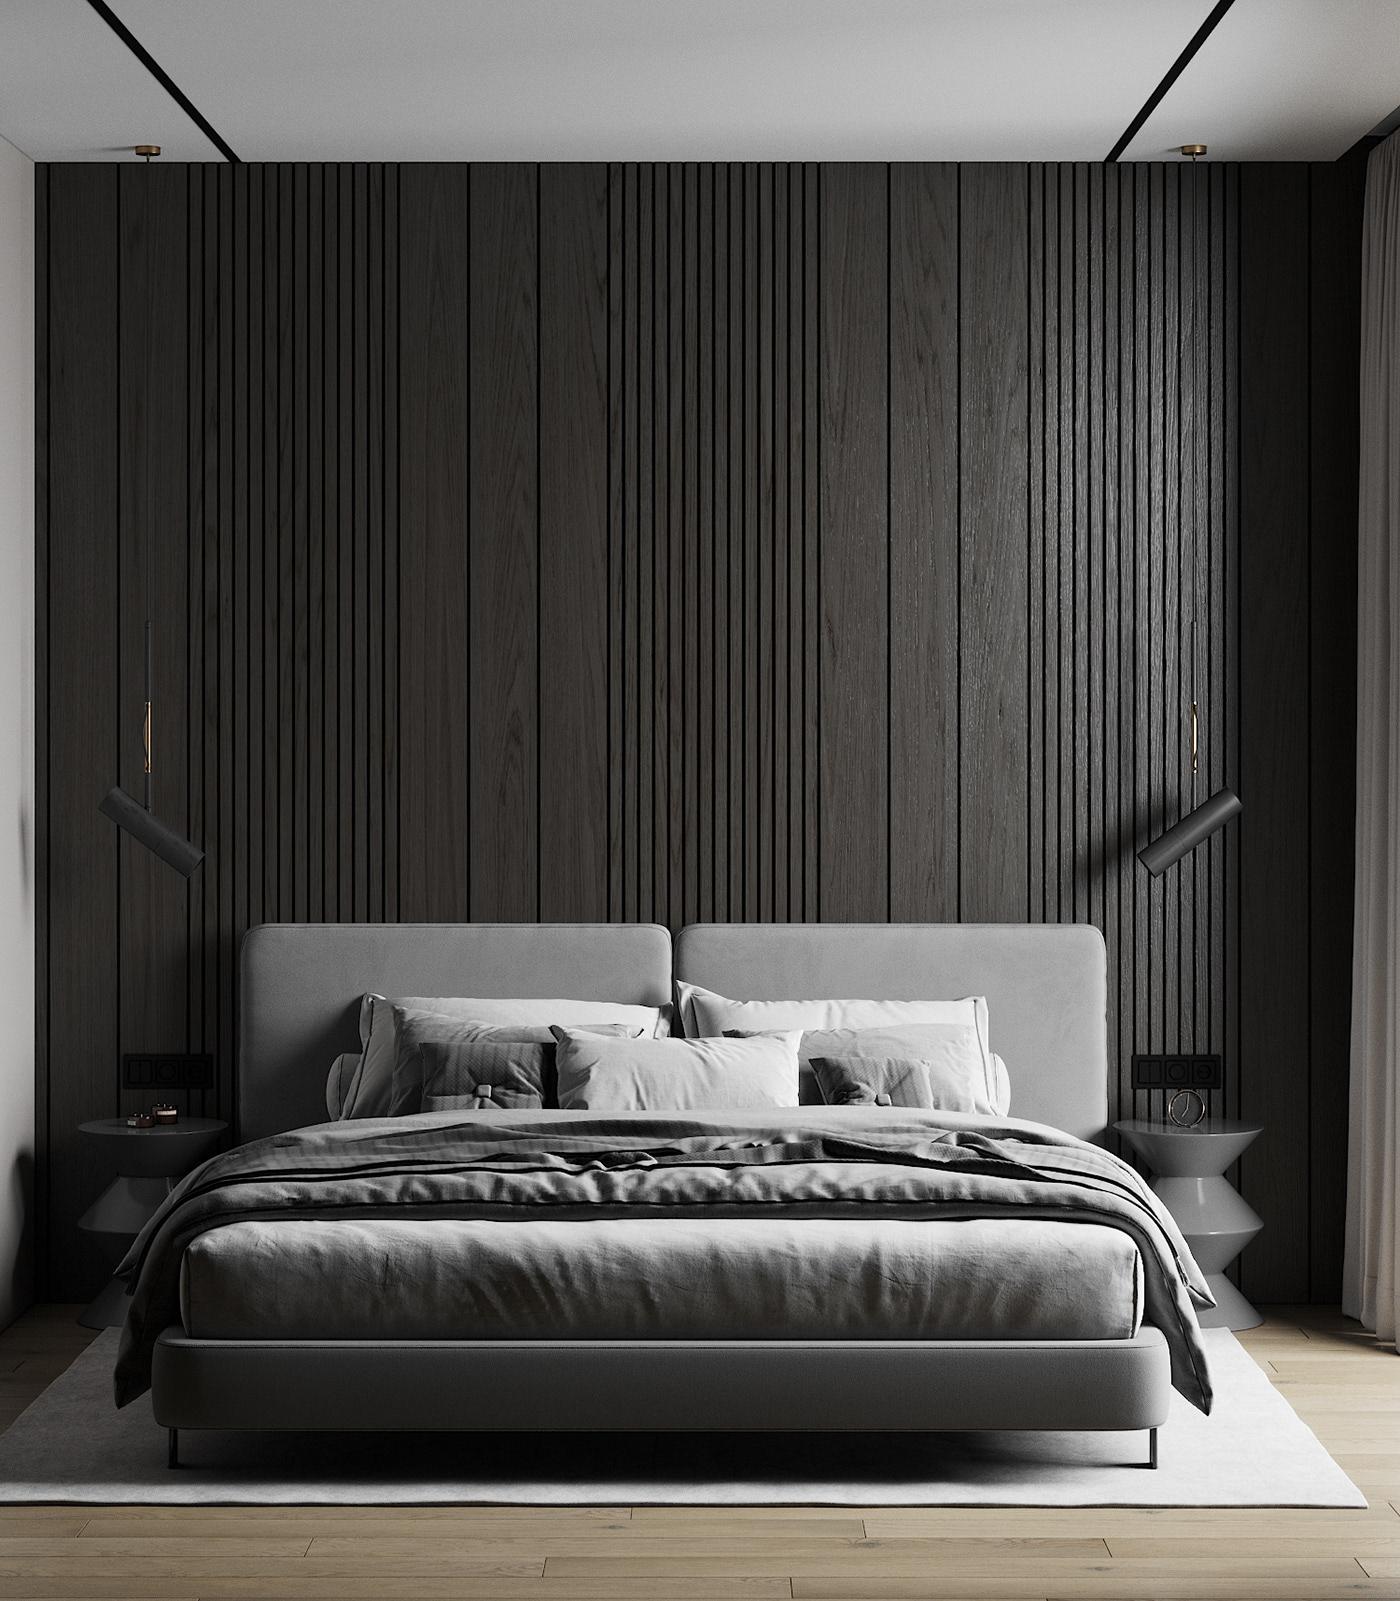 Image may contain: sofa, indoor and wall